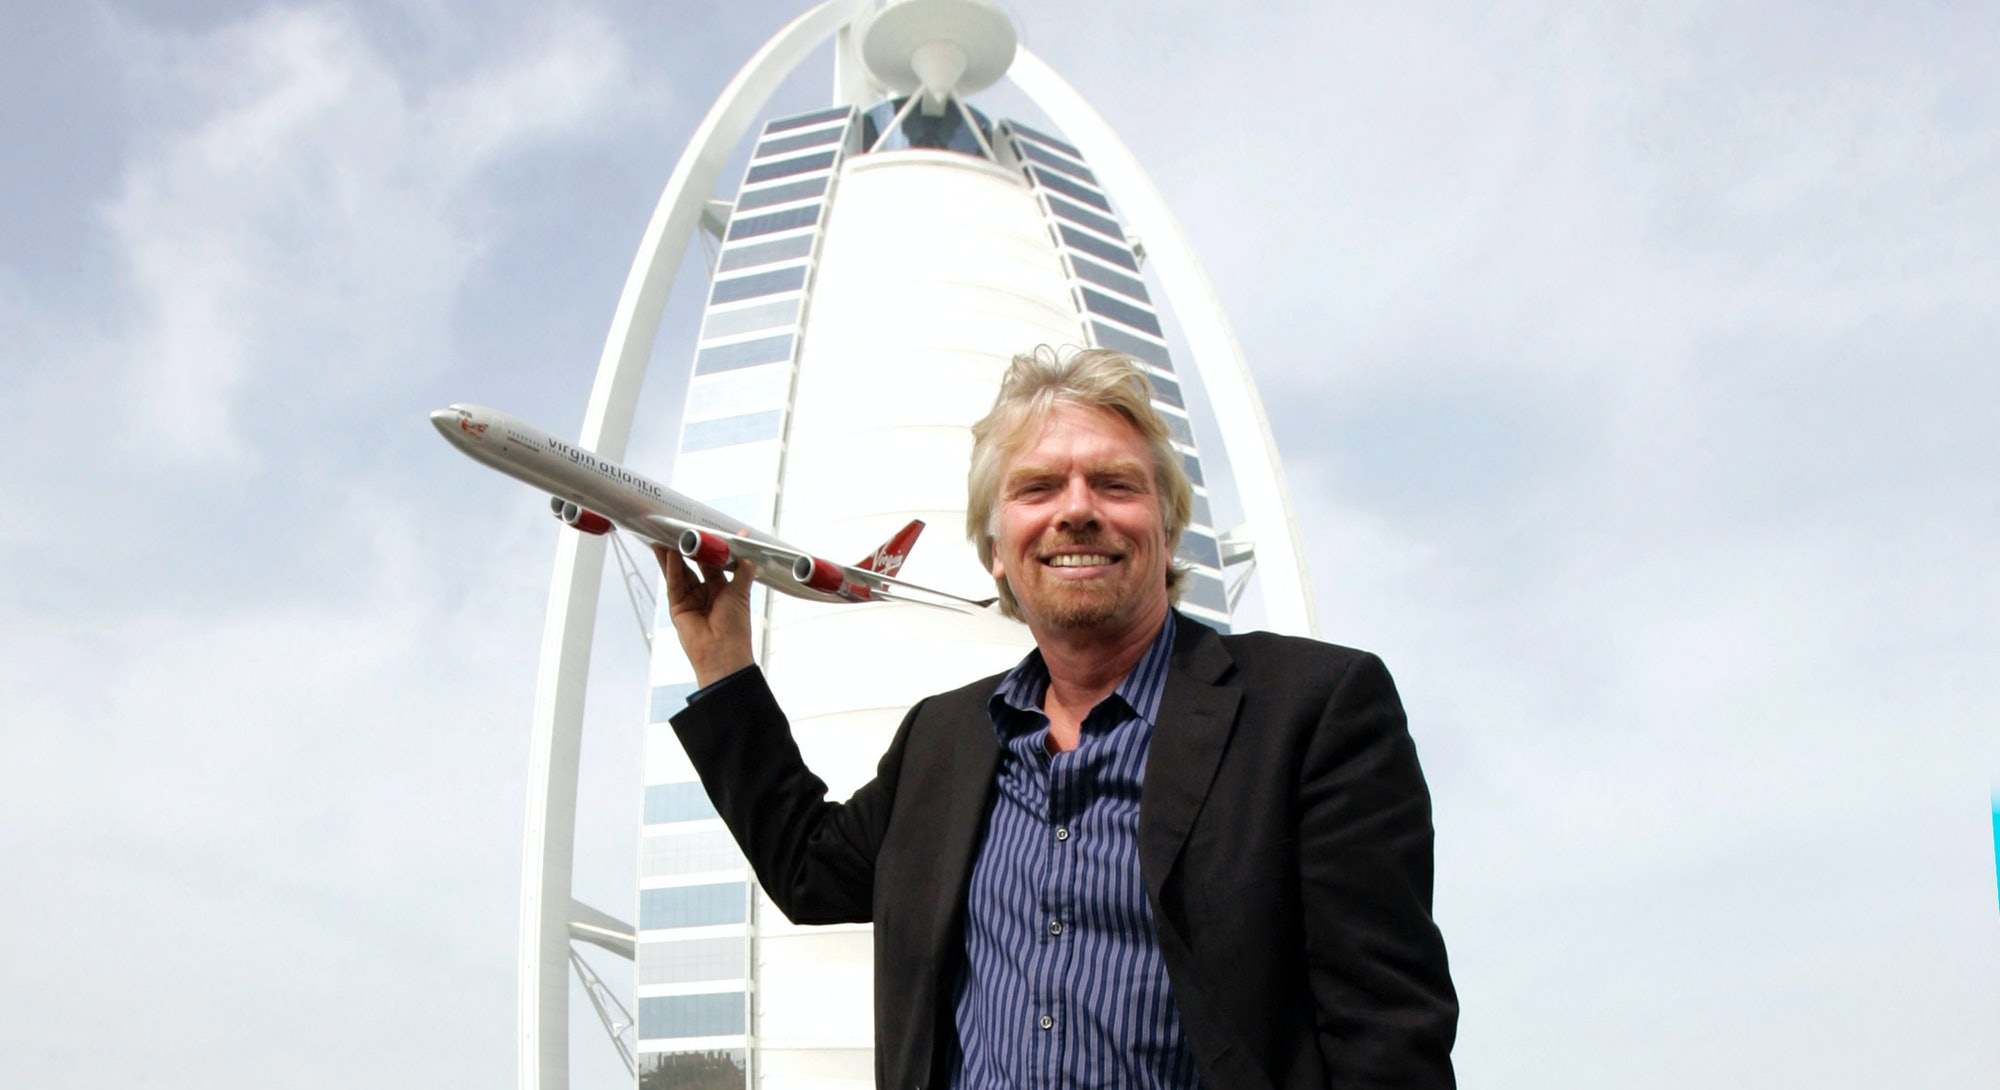 British entrepreneur Sir Richard Branson, who owns Virgin Group, holds a model Virgin airplane in fr...